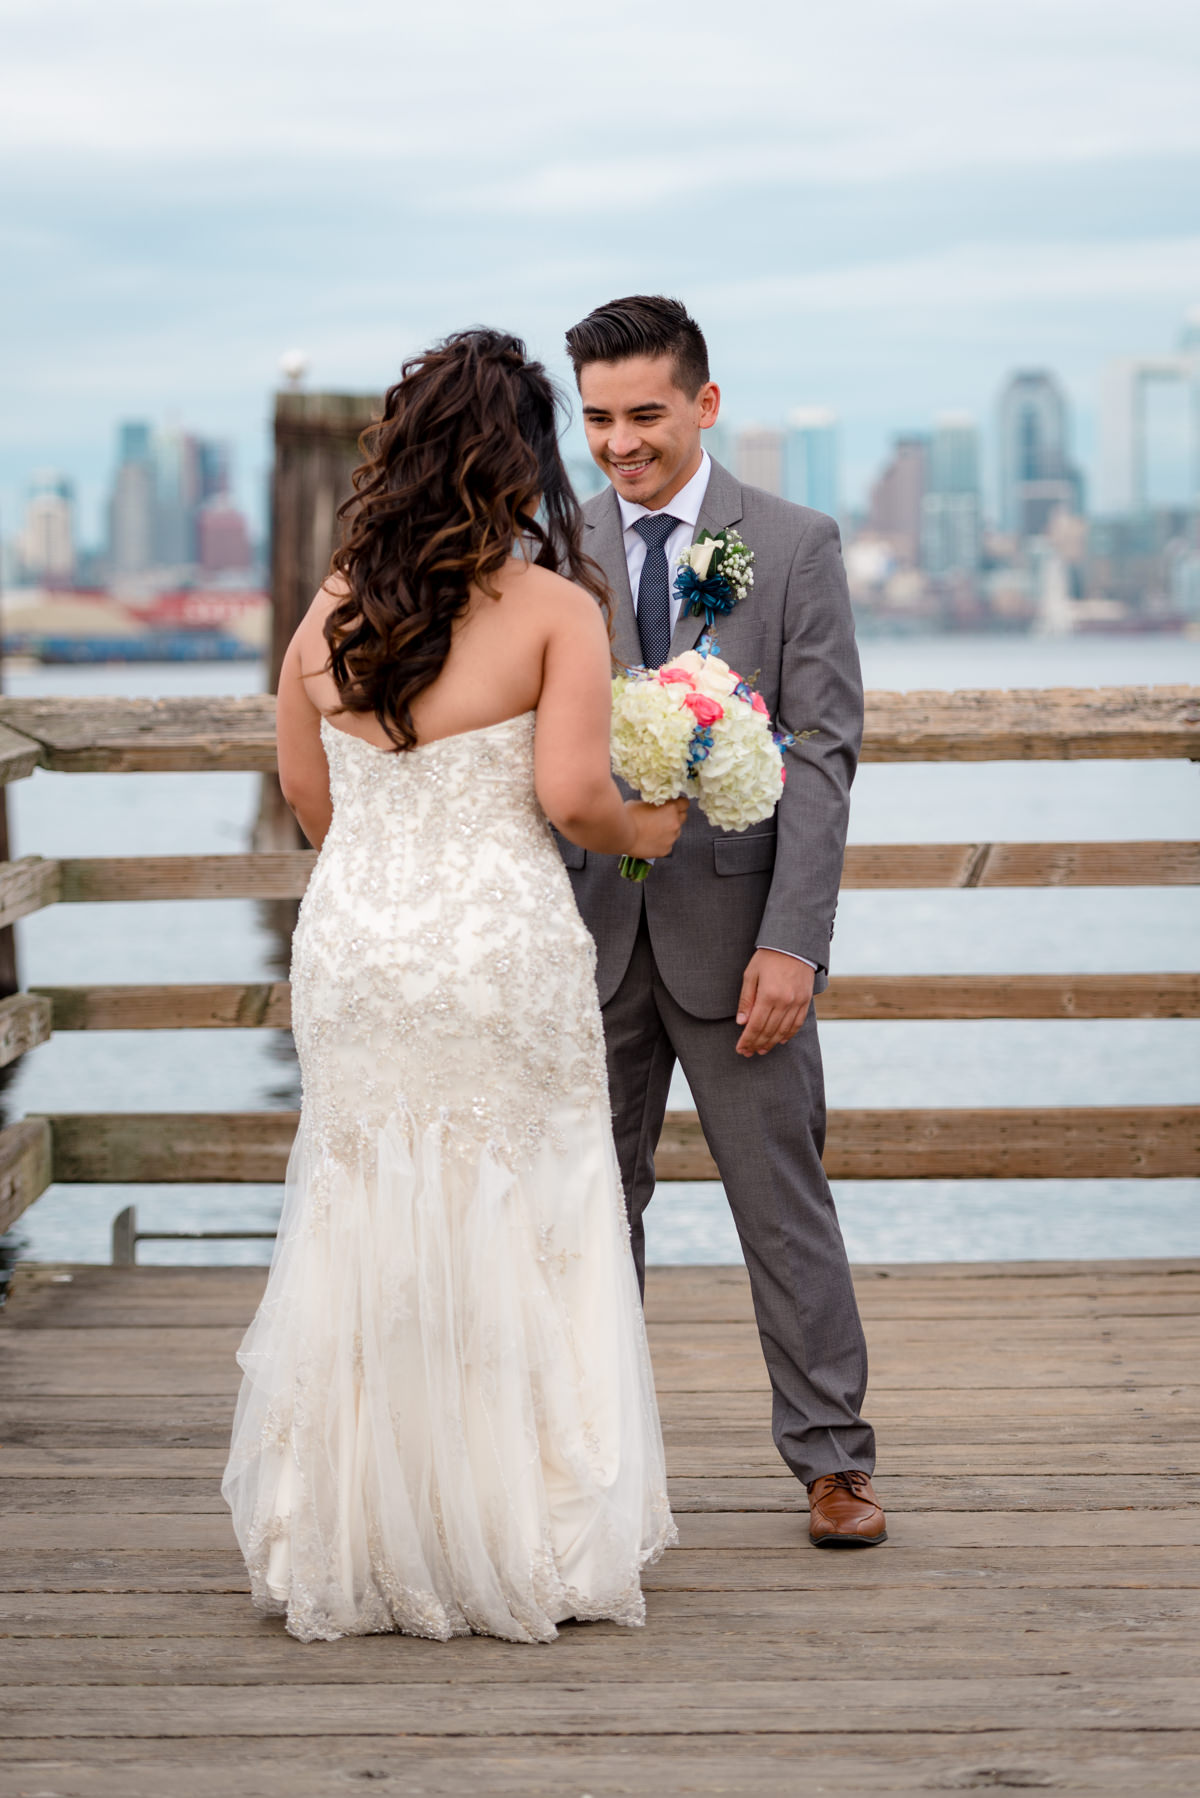 Andrew Tat - Documentary Wedding Photography - Salty's - Seattle, Washington -Mark & Marcy - 06.jpg